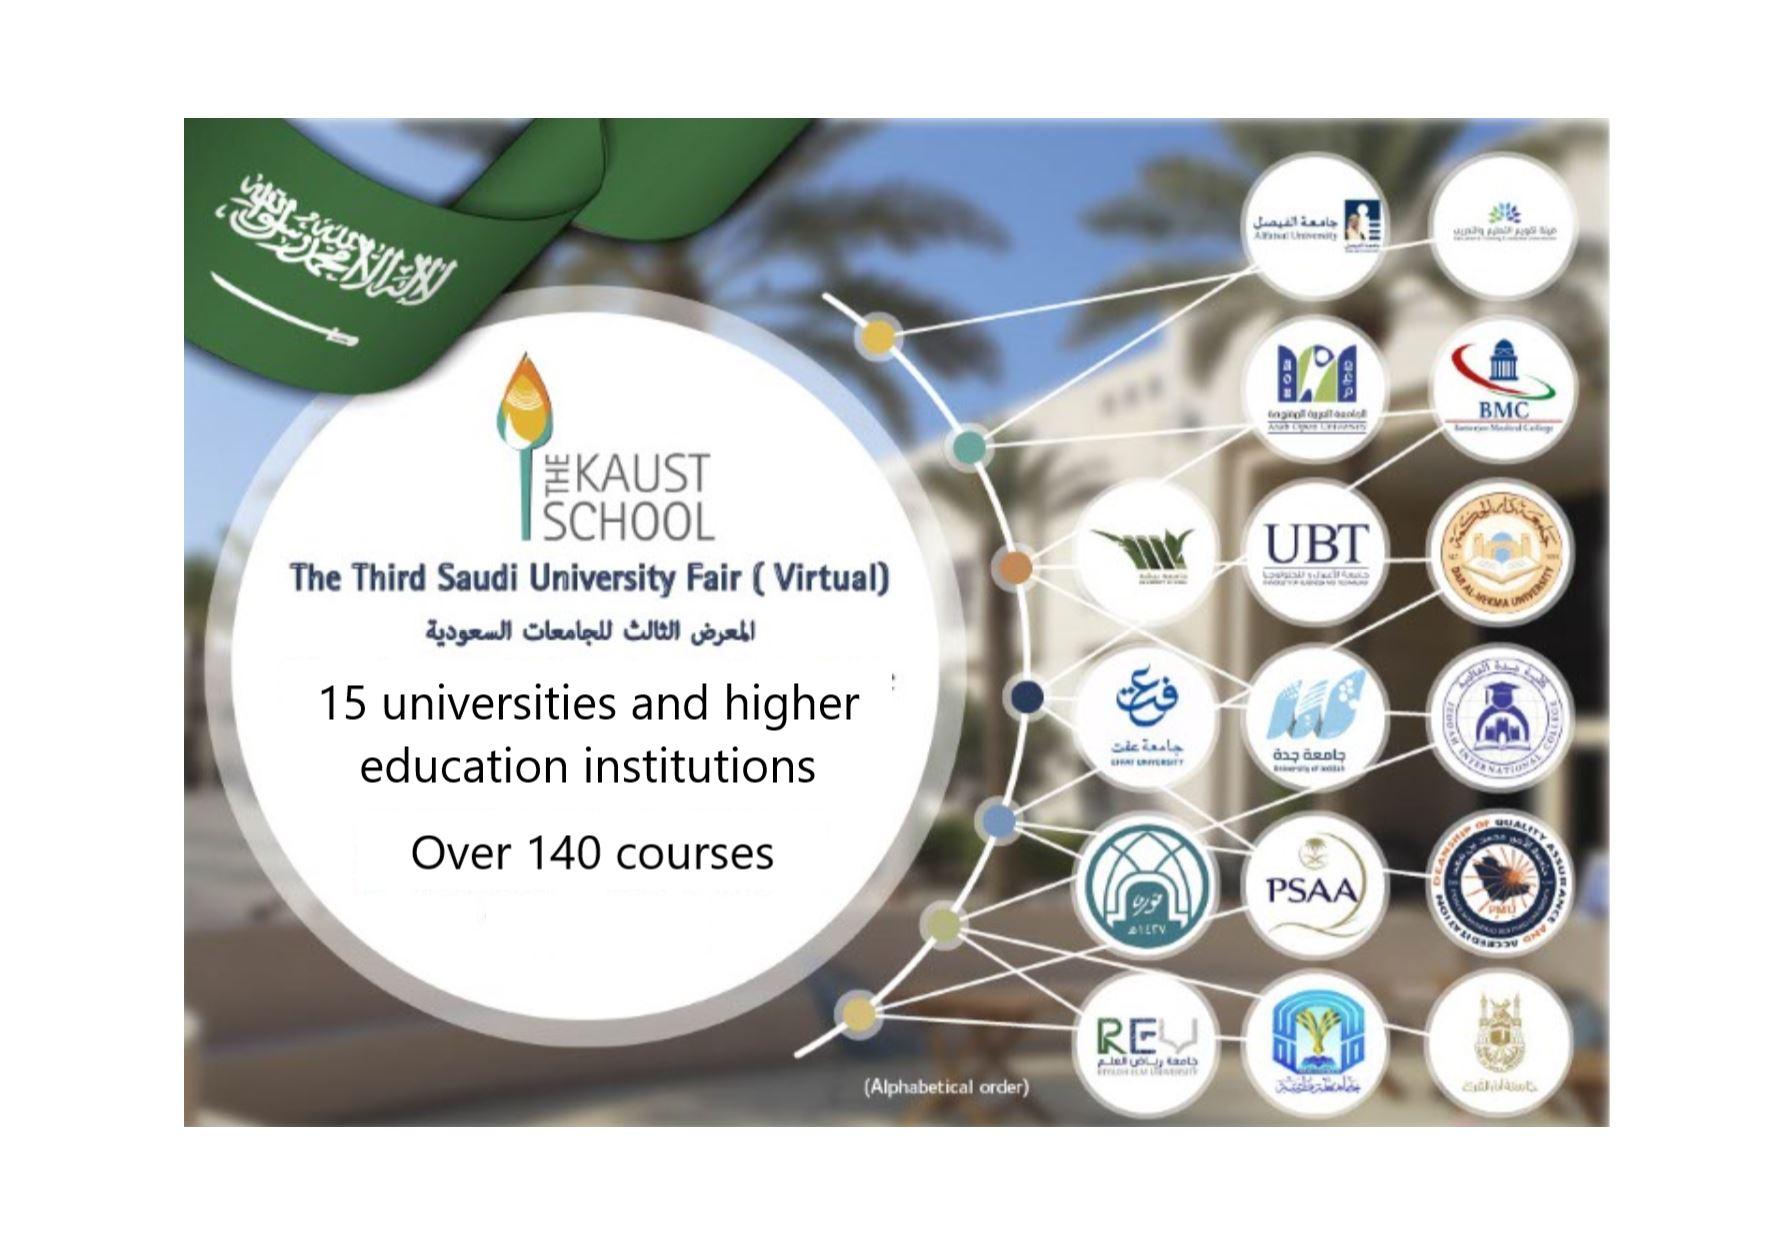 Third Saudi University Fair